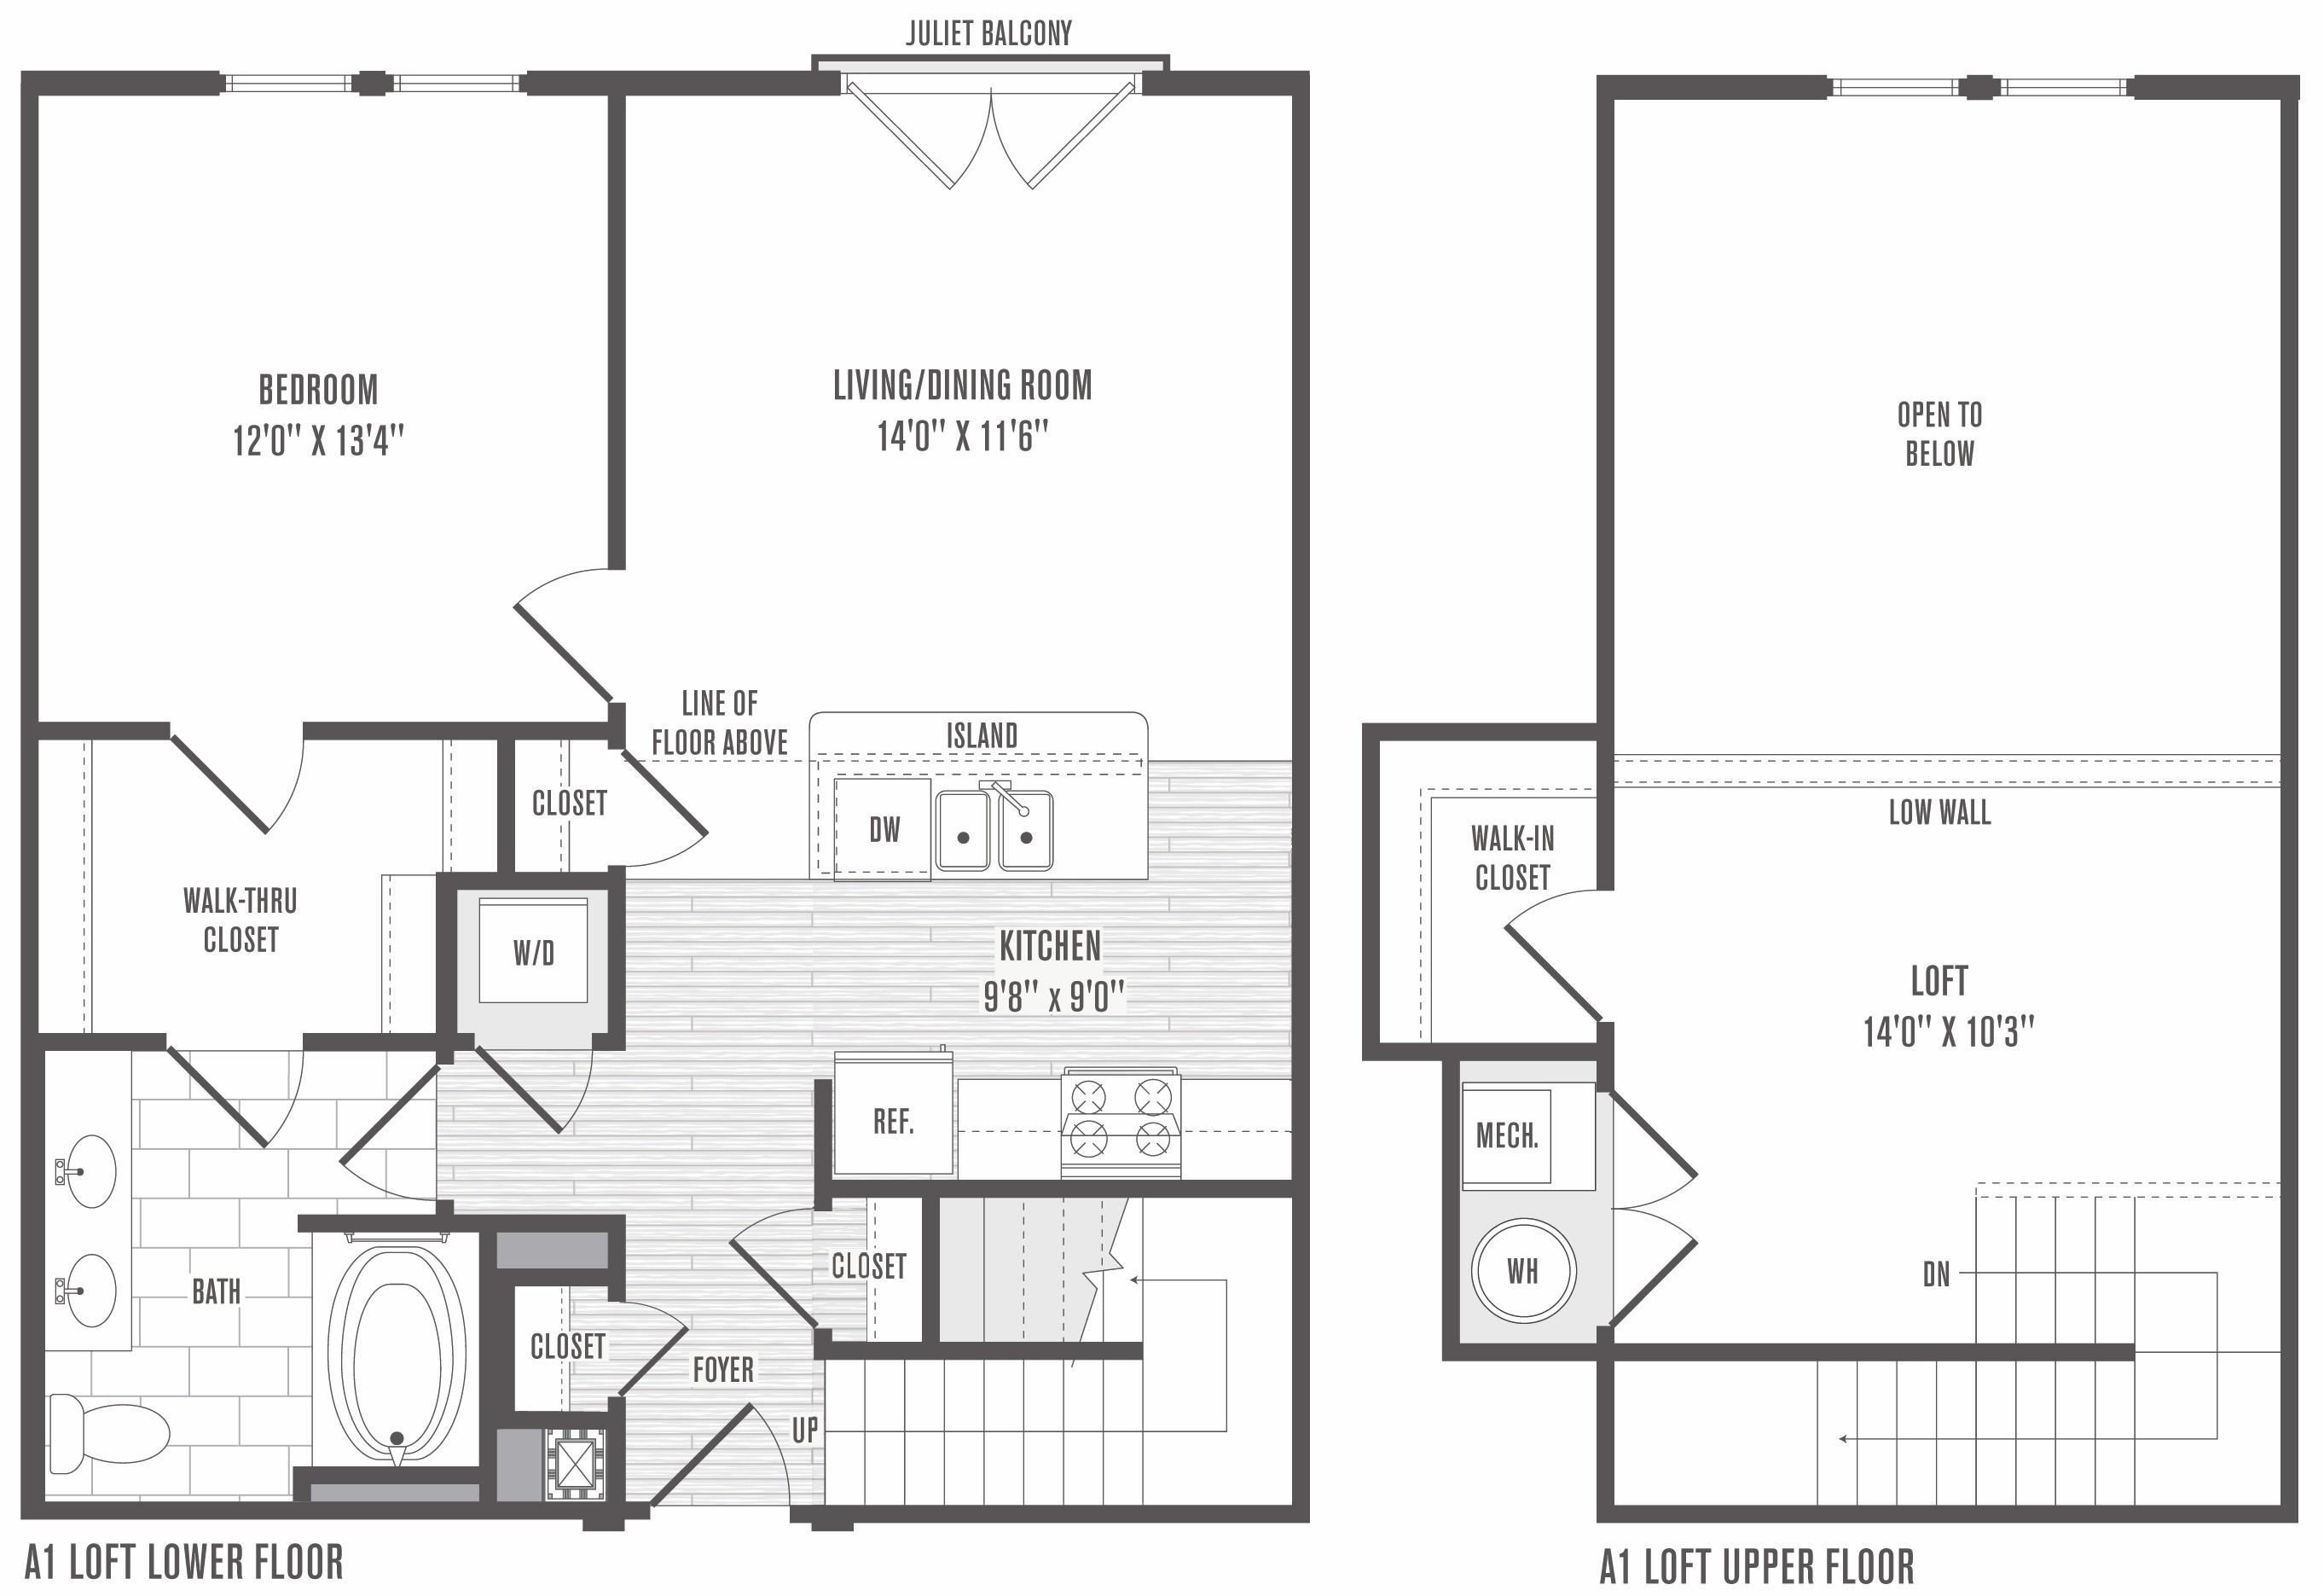 passive house plans nice floor plan designs for homes best passive solar house plans